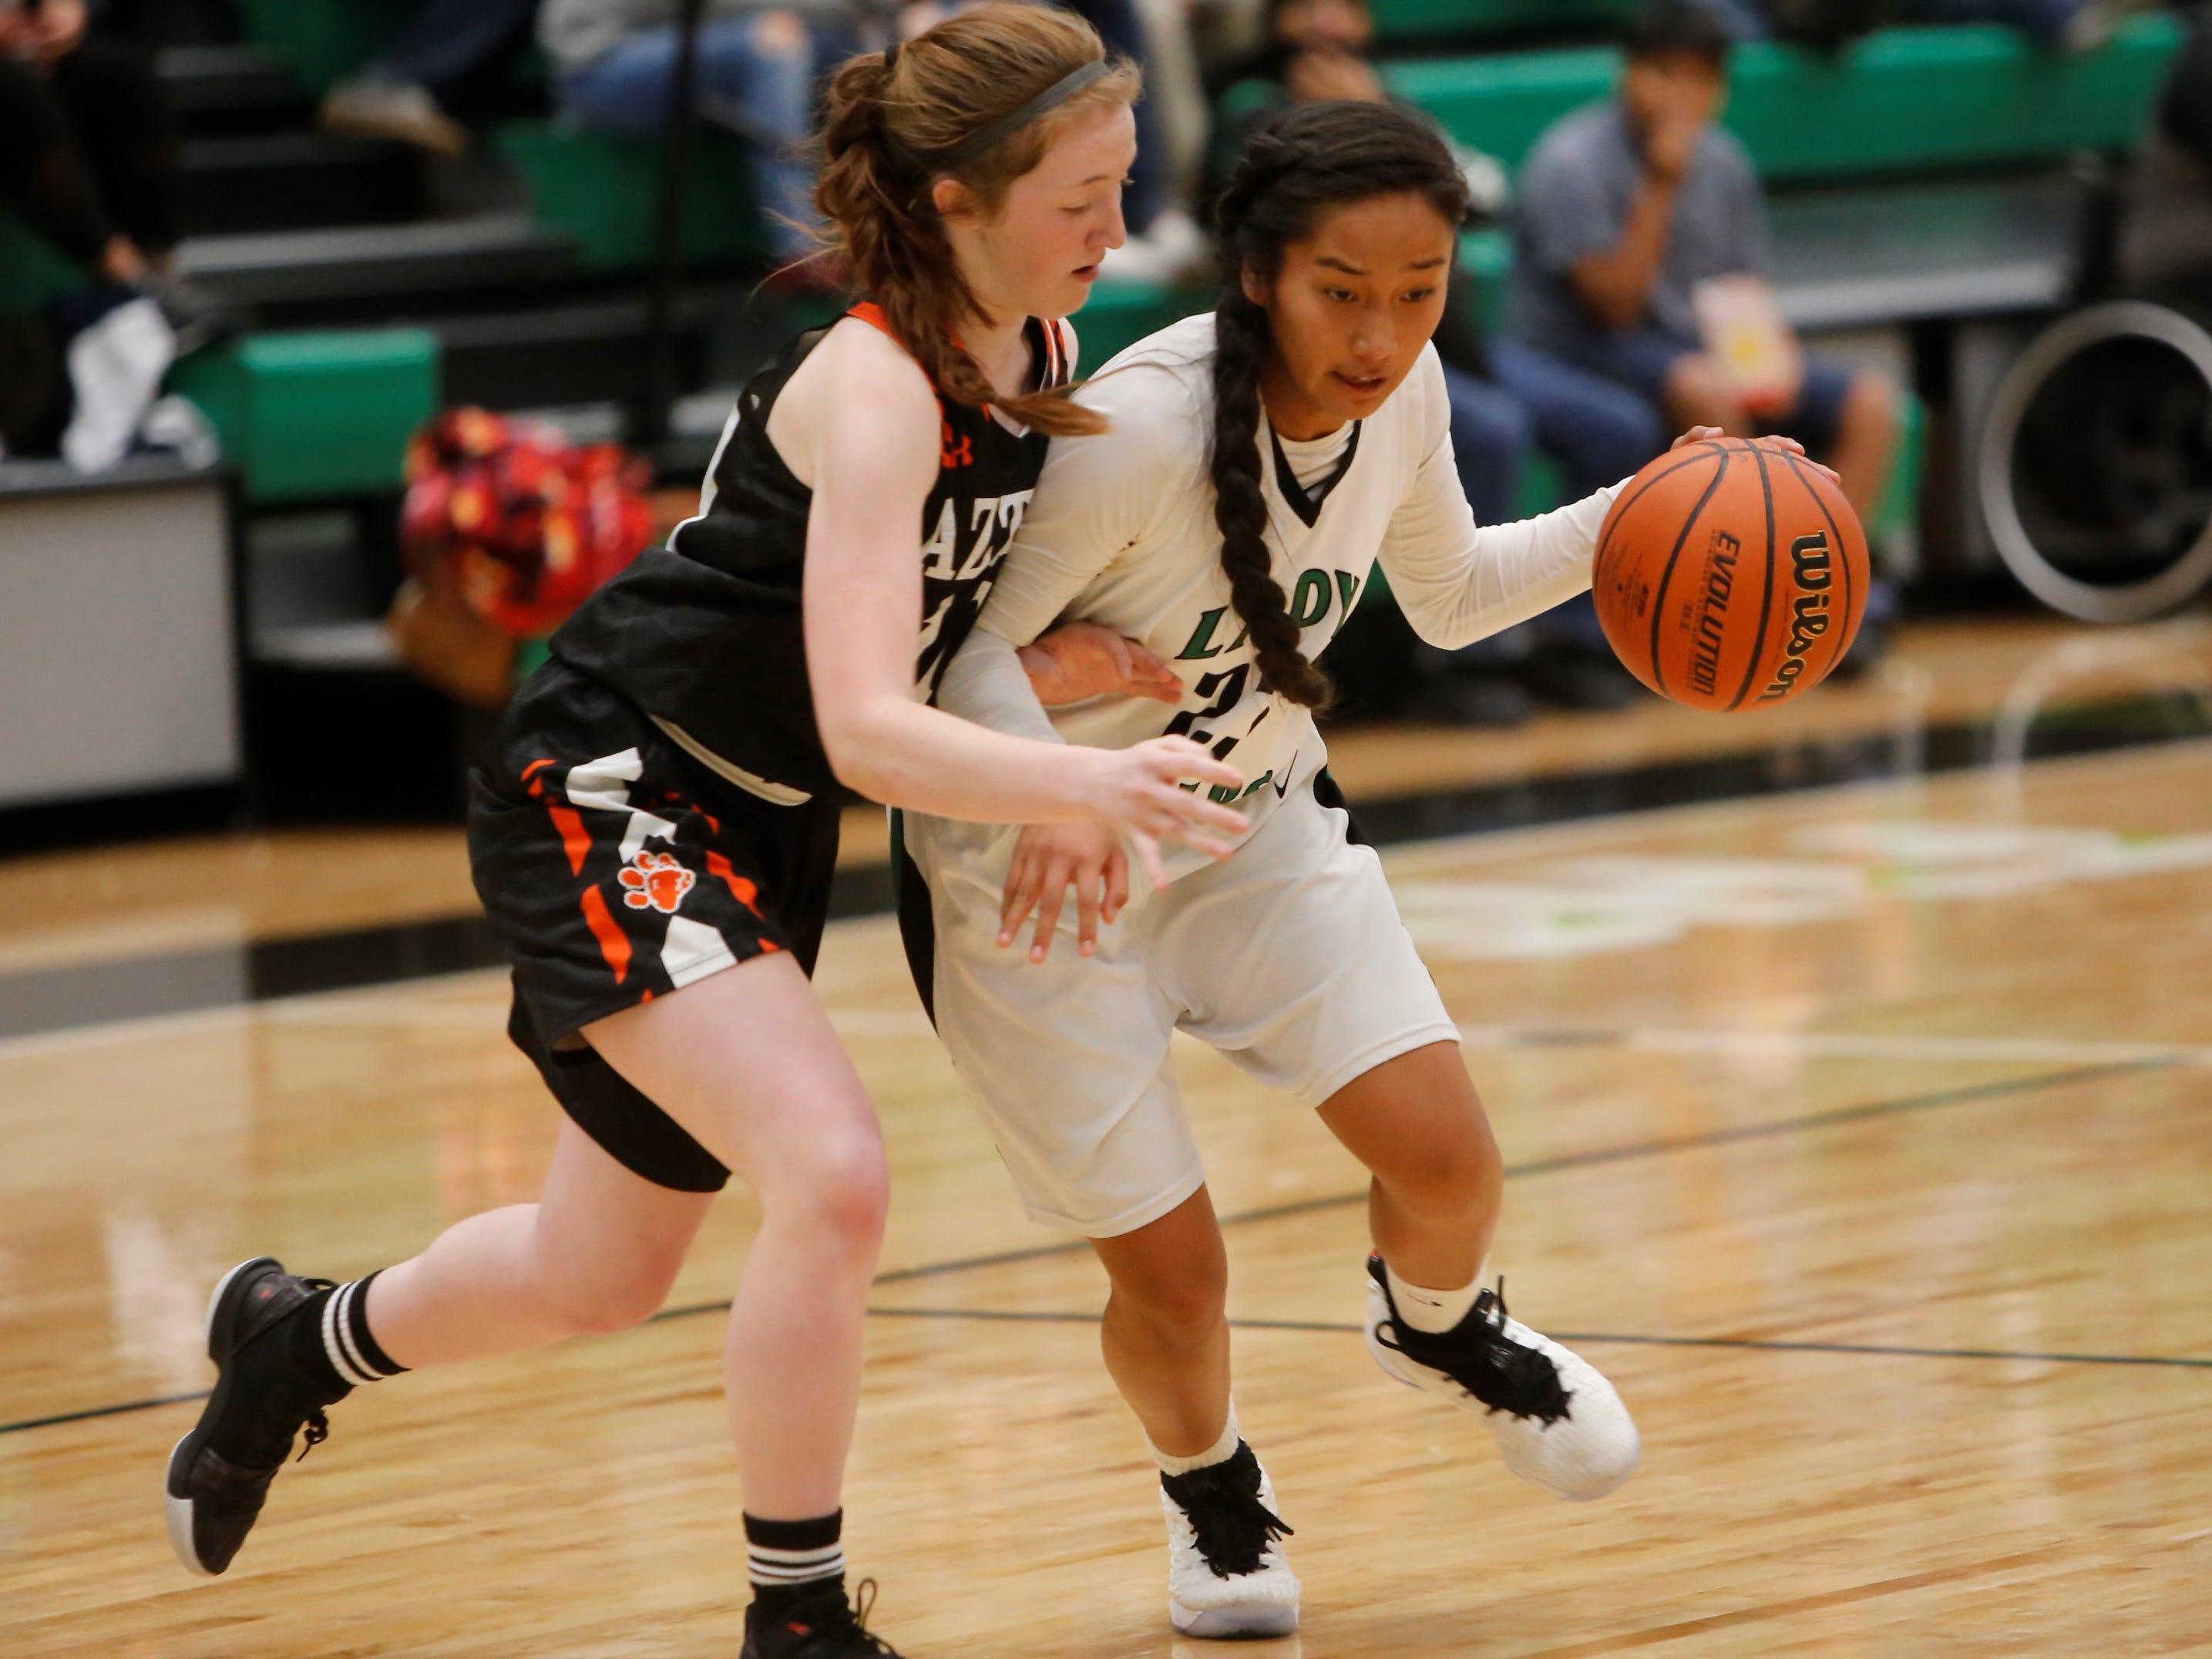 Farmington's Kiiyani Anitielu attacks the basket against Aztec's Aztec's Jessi Gillentine during Tuesday's game at Scorpion Arena.